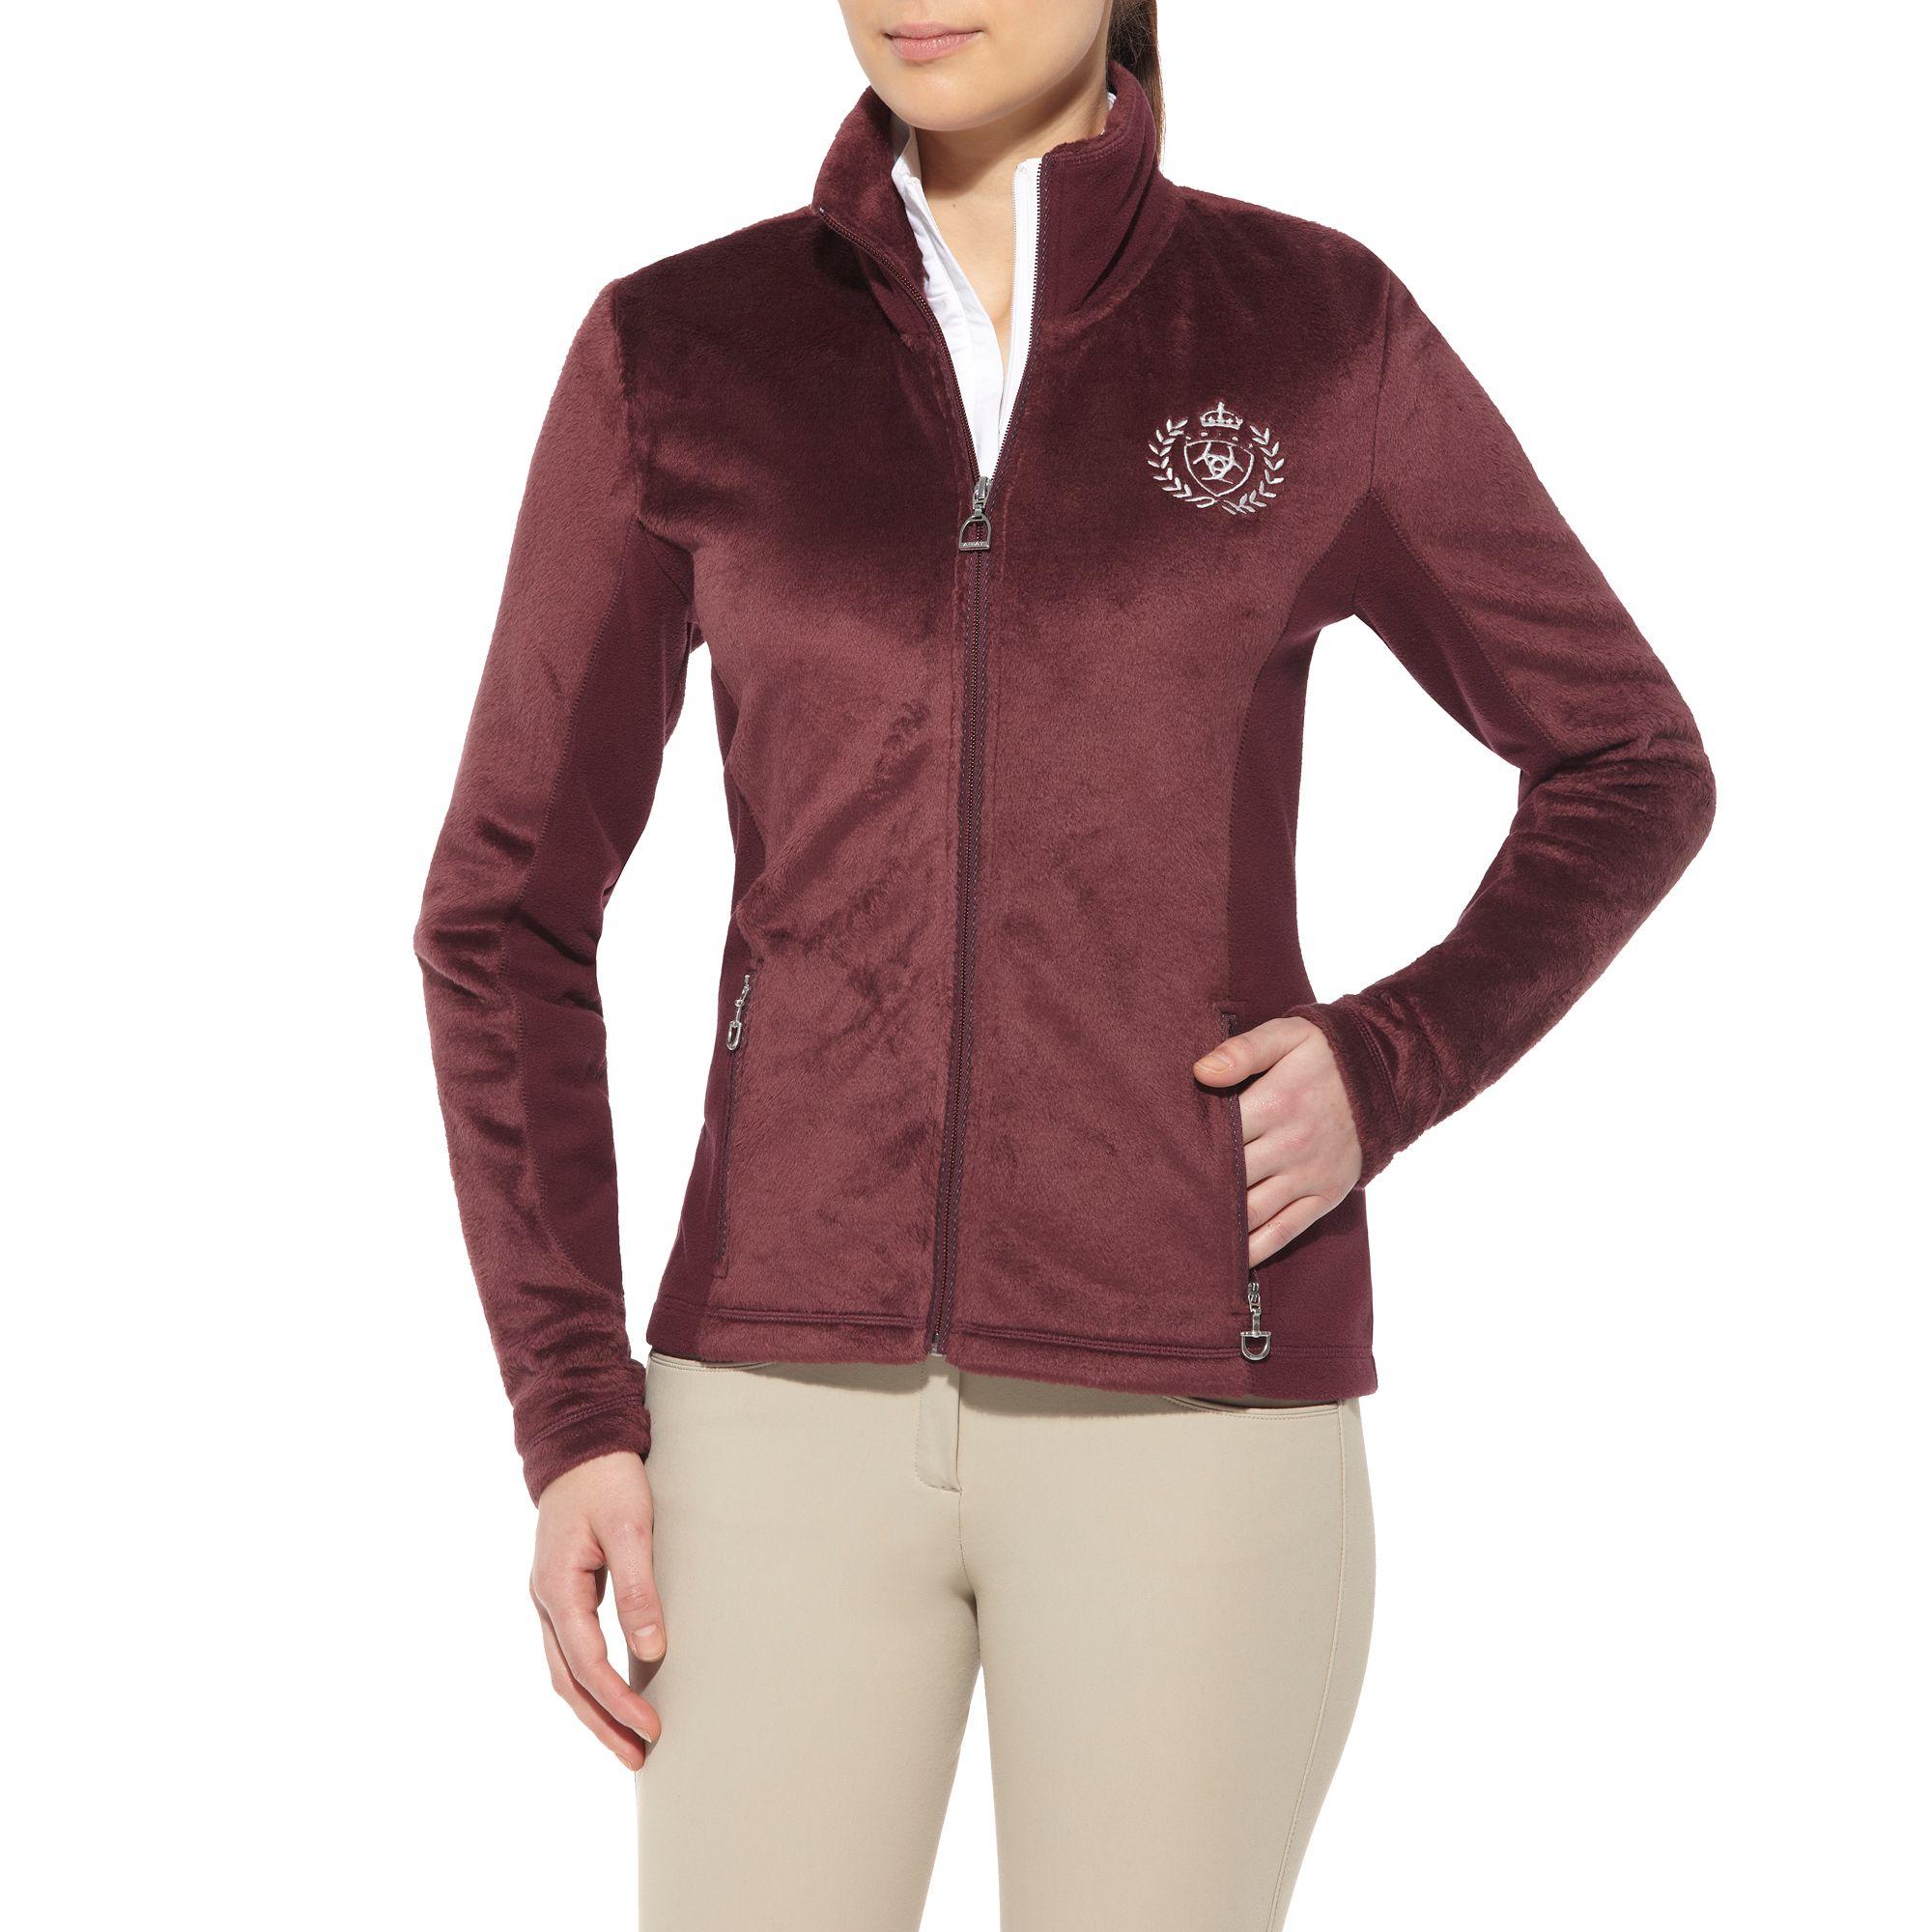 Ariat Stella Fleece Jacket - Ladies, Wine